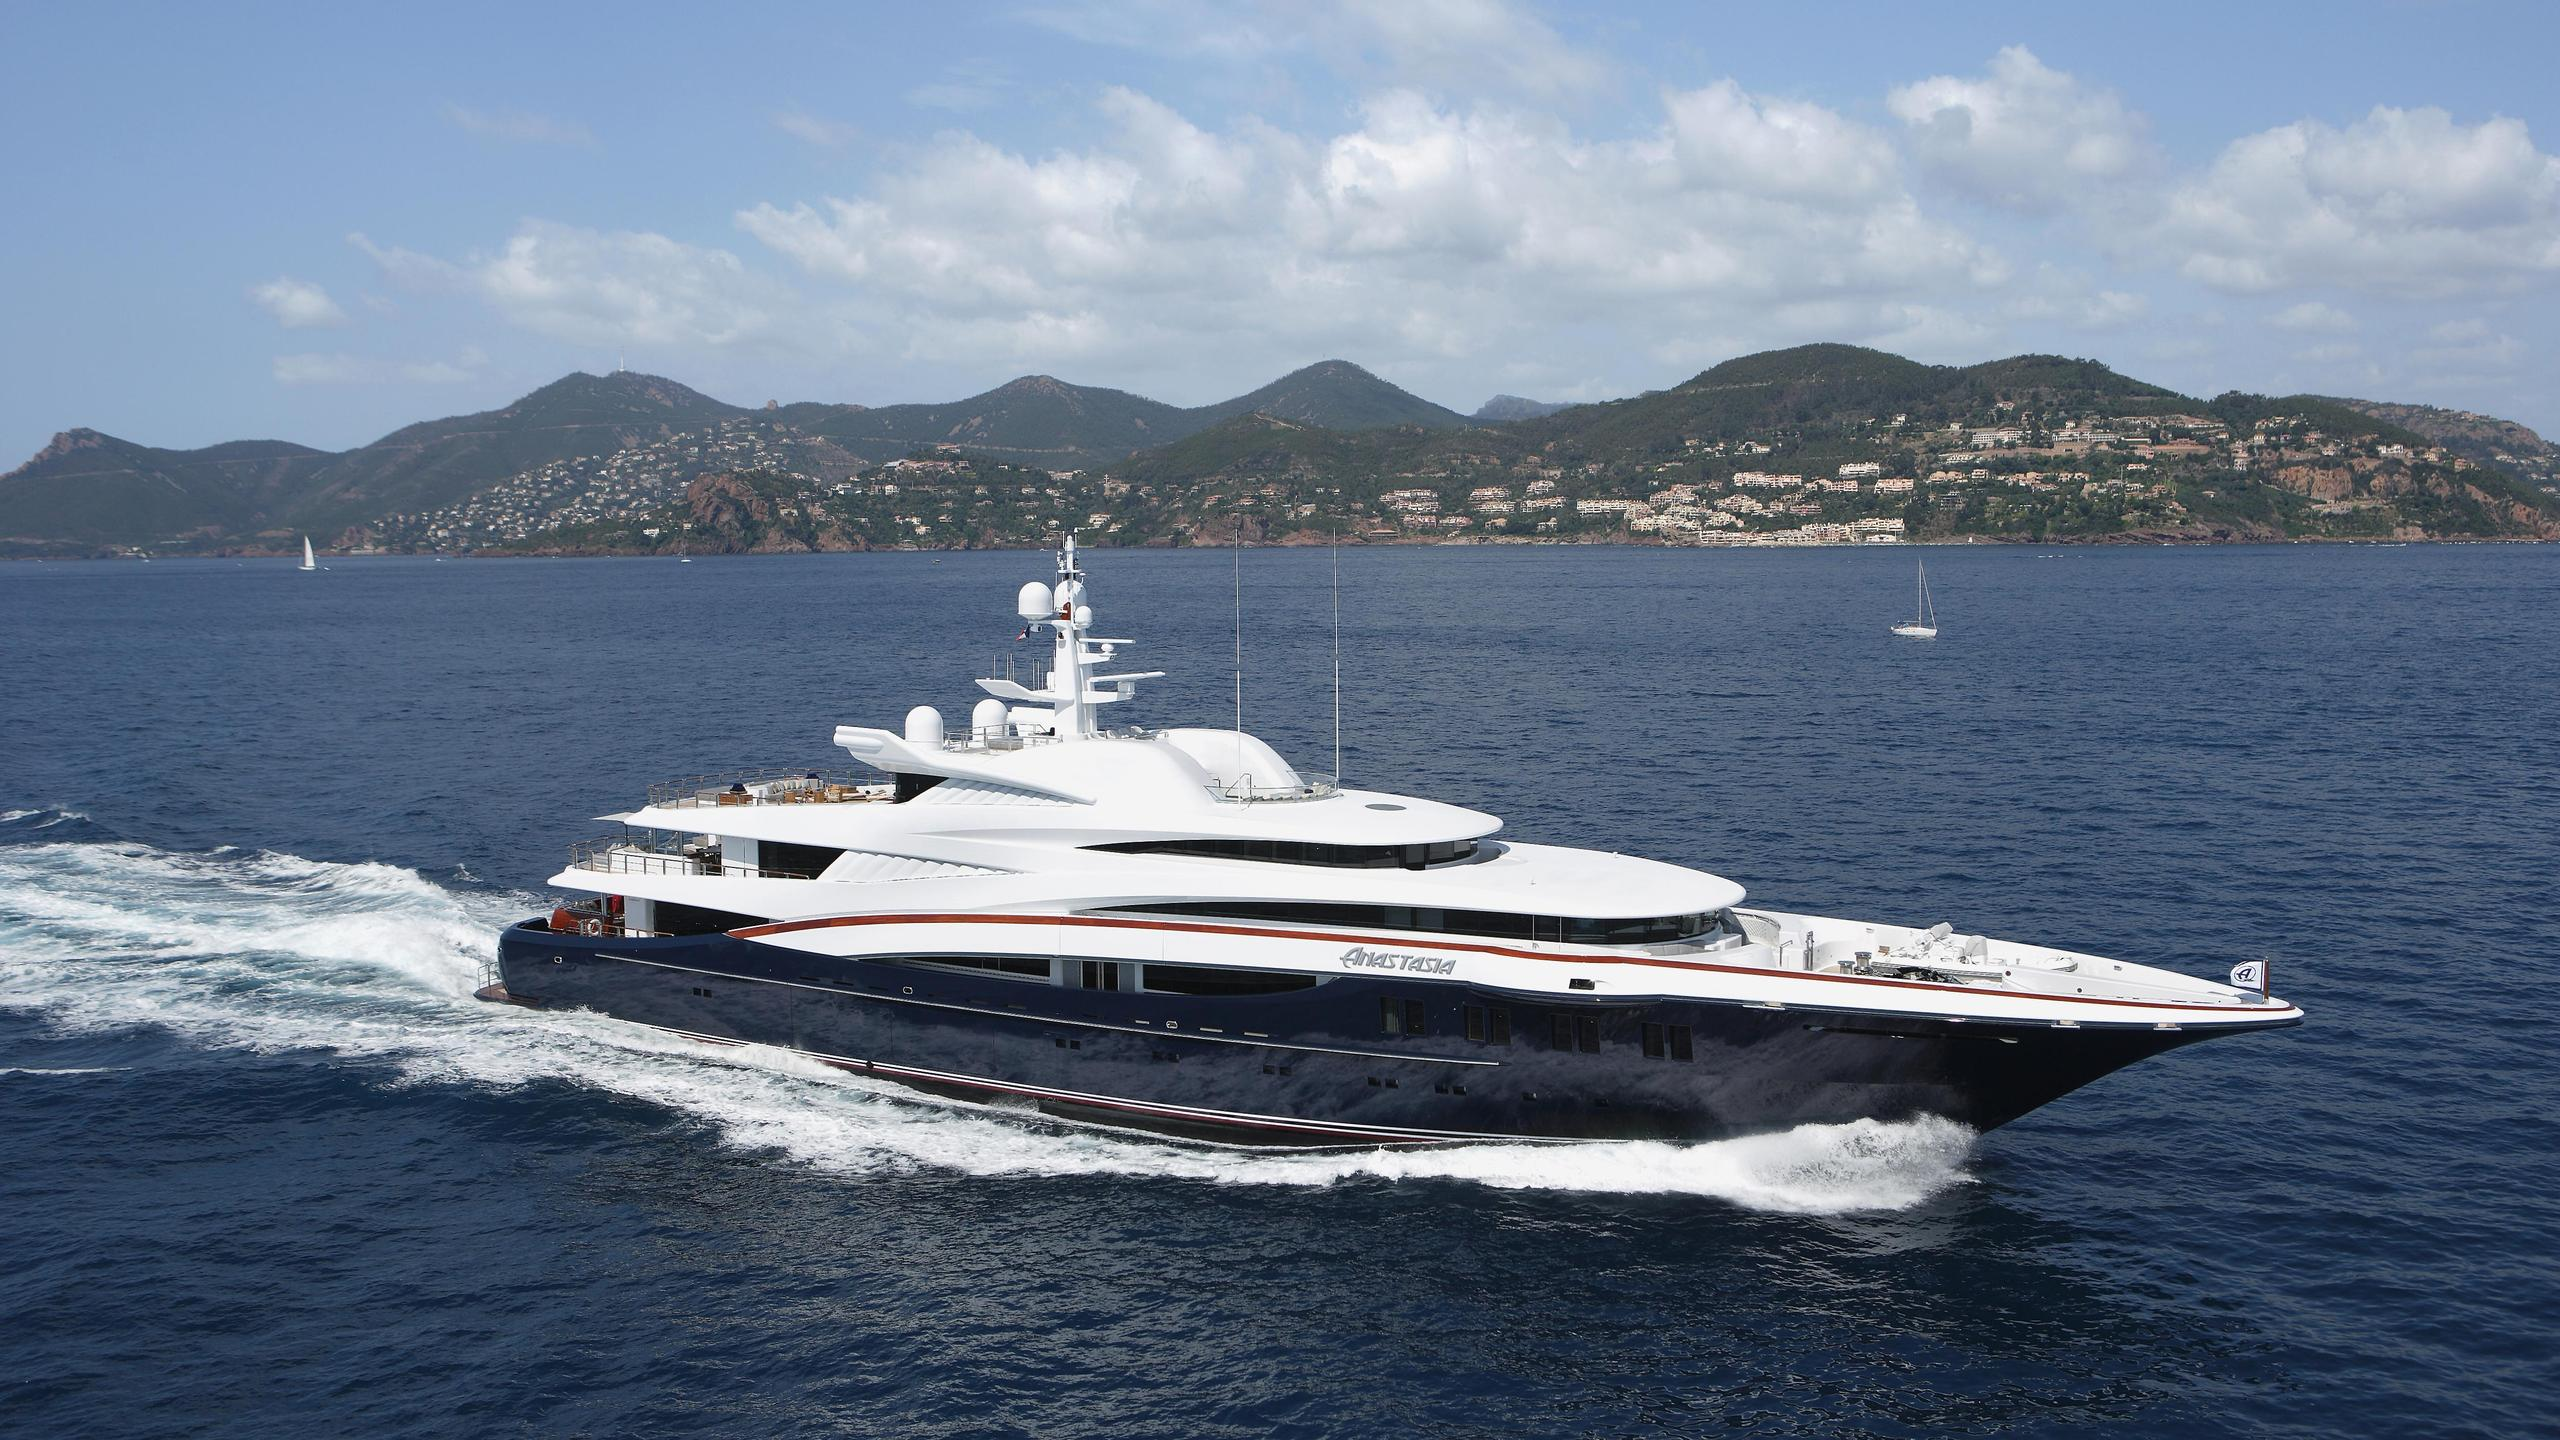 anastasia-motor-yacht-oceanco-2008-75m-cruising